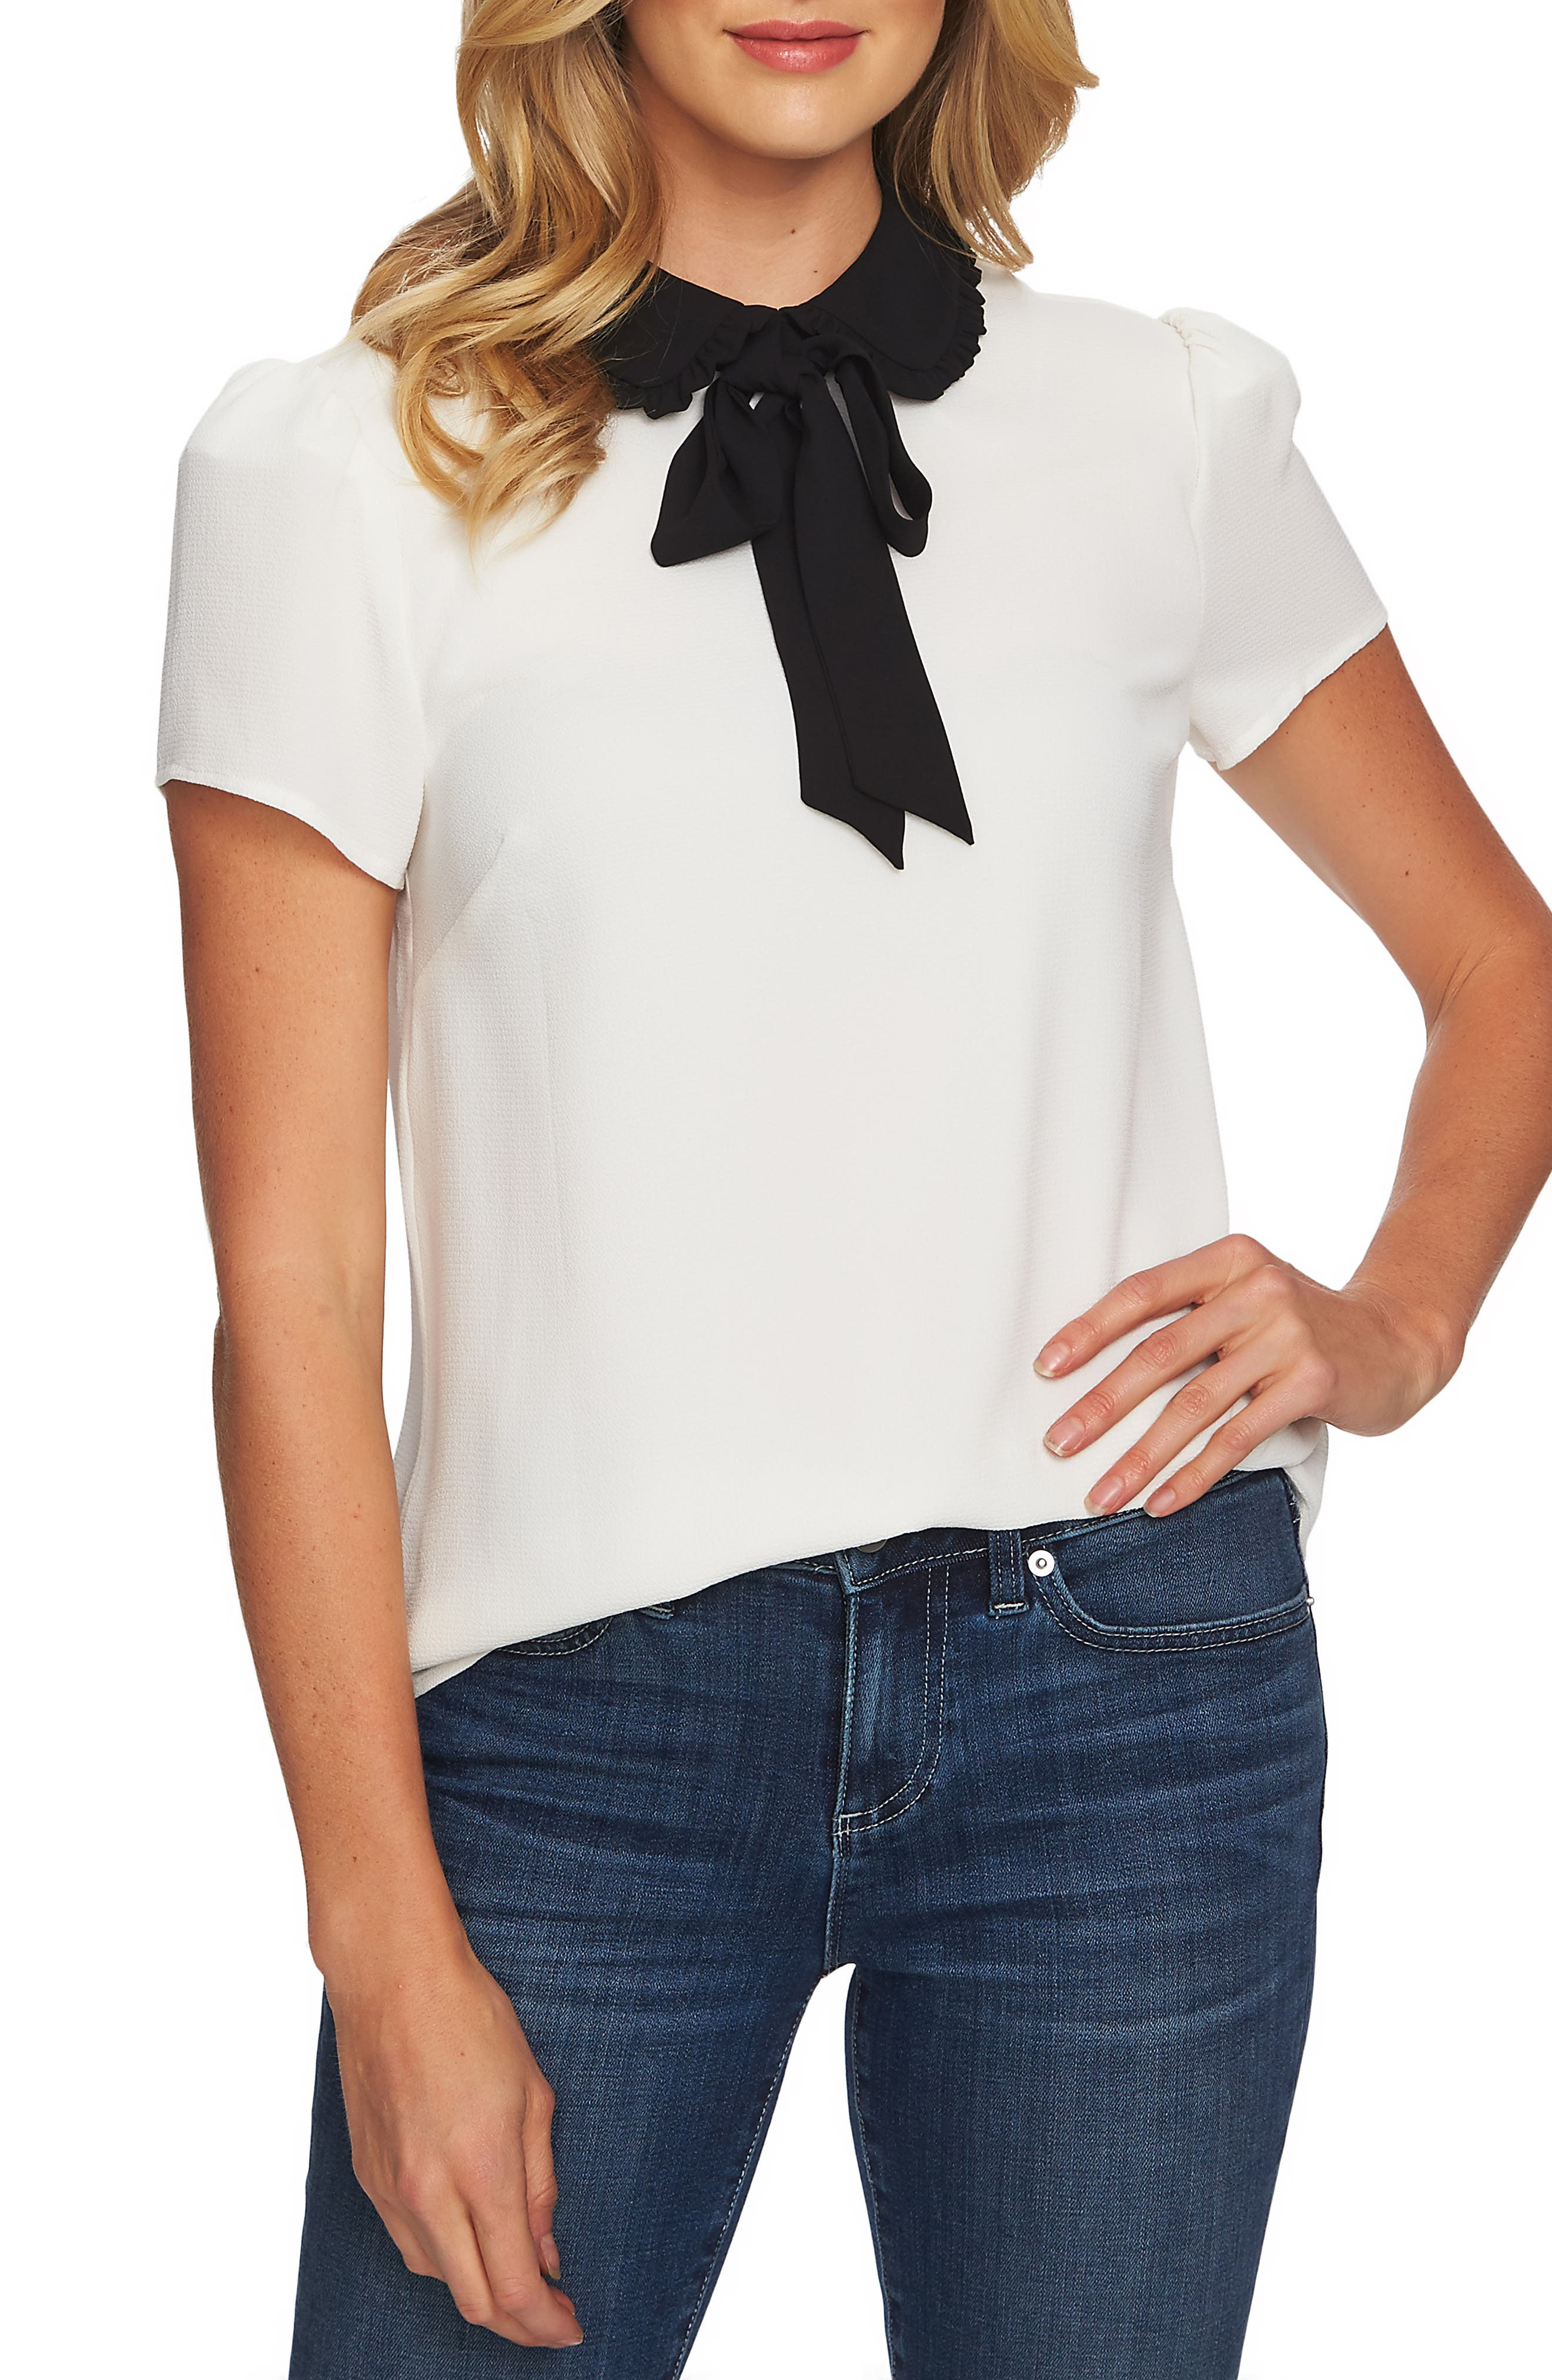 Vintage Tops & Retro Shirts, Halter Tops, Blouses Womens Cece Ruffle Collar Short Sleeve Blouse Size Large - White $79.00 AT vintagedancer.com